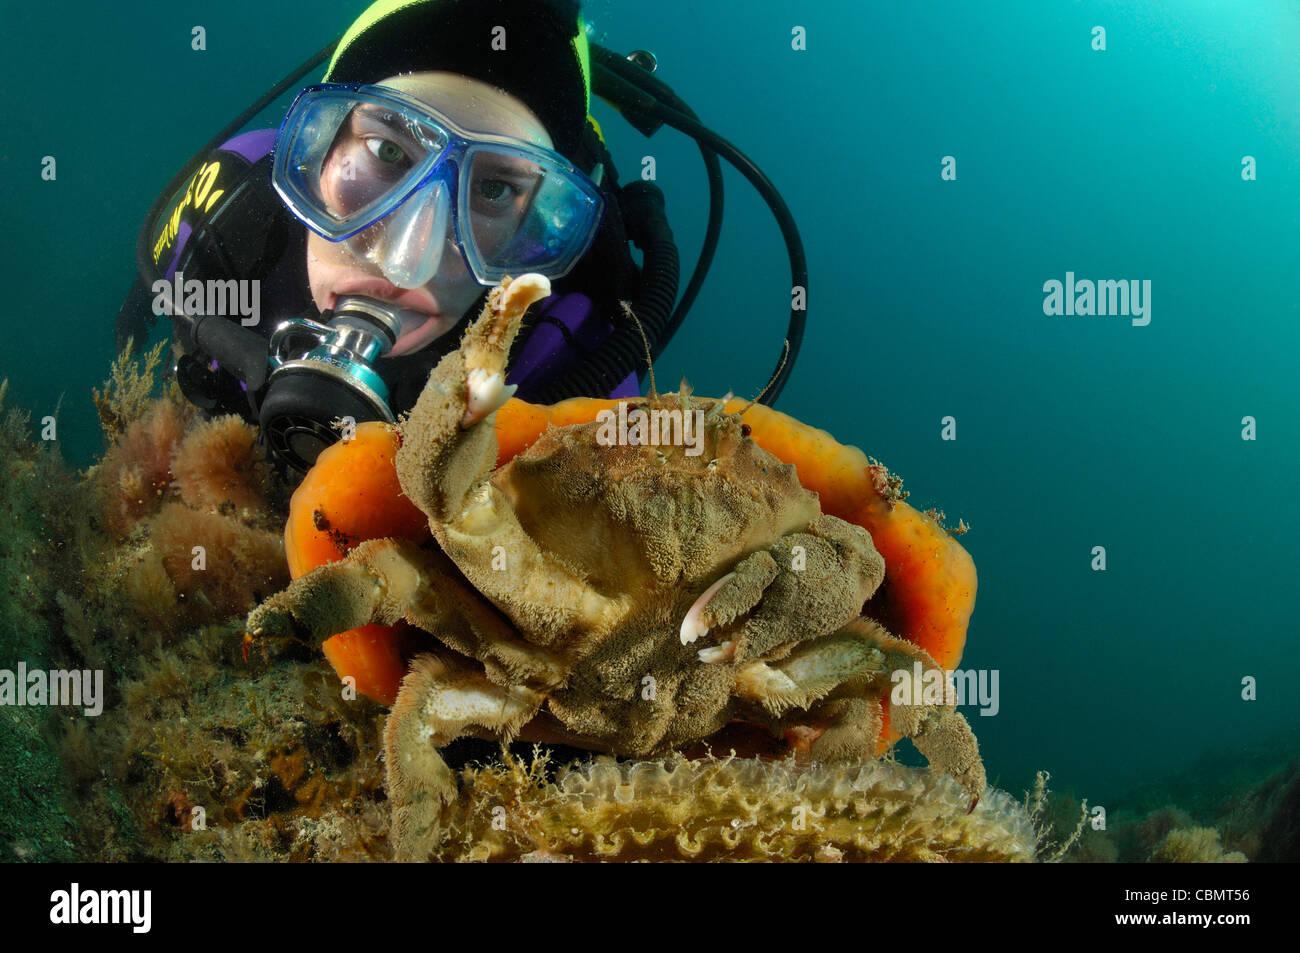 Sponge Crab carry orange Sponge, Dromia personata, Piran, Adriatic Sea, Slovenia - Stock Image